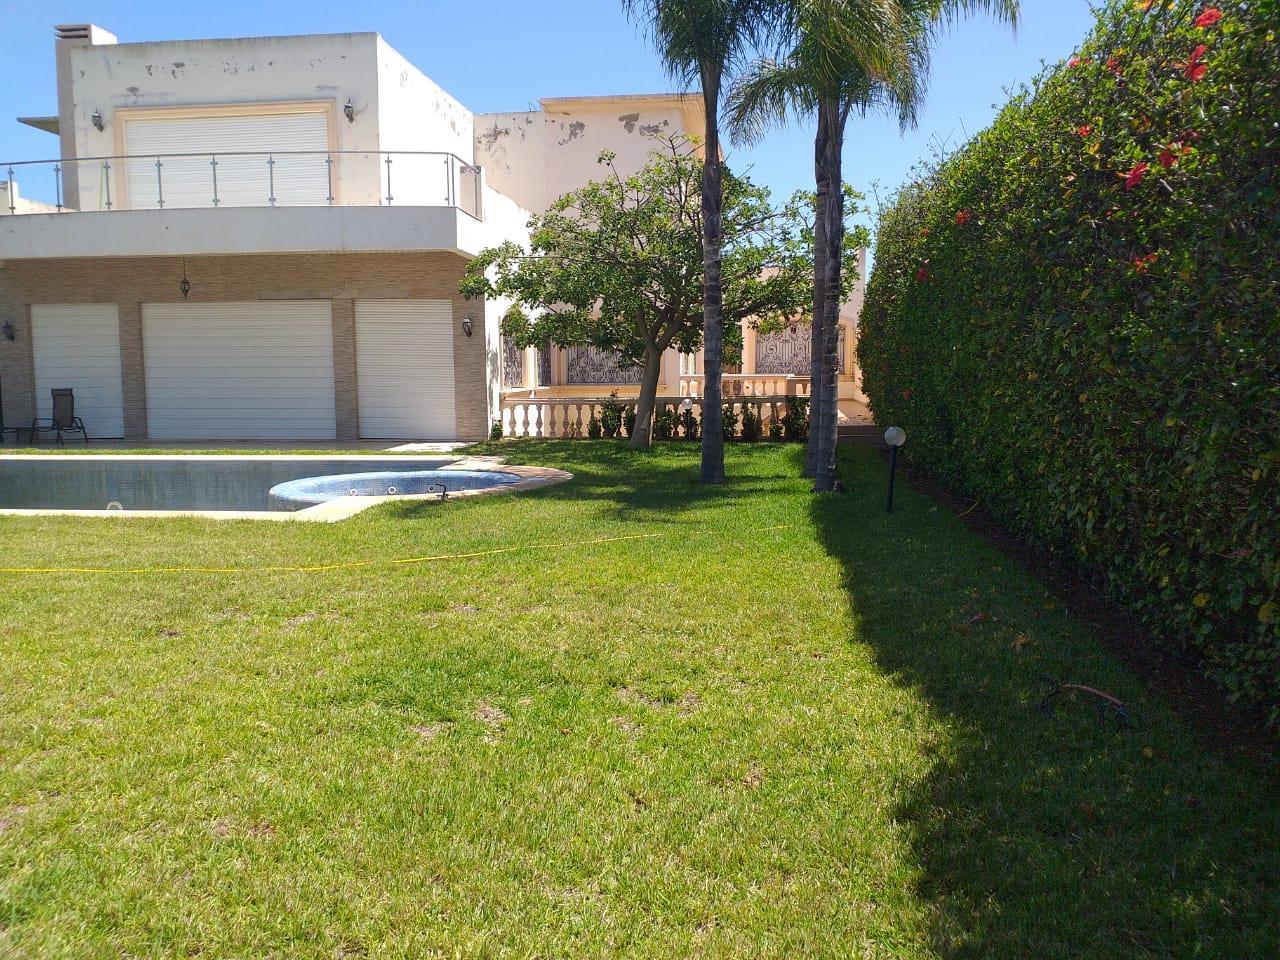 Super Villa a vendre ain diab à Casablanca